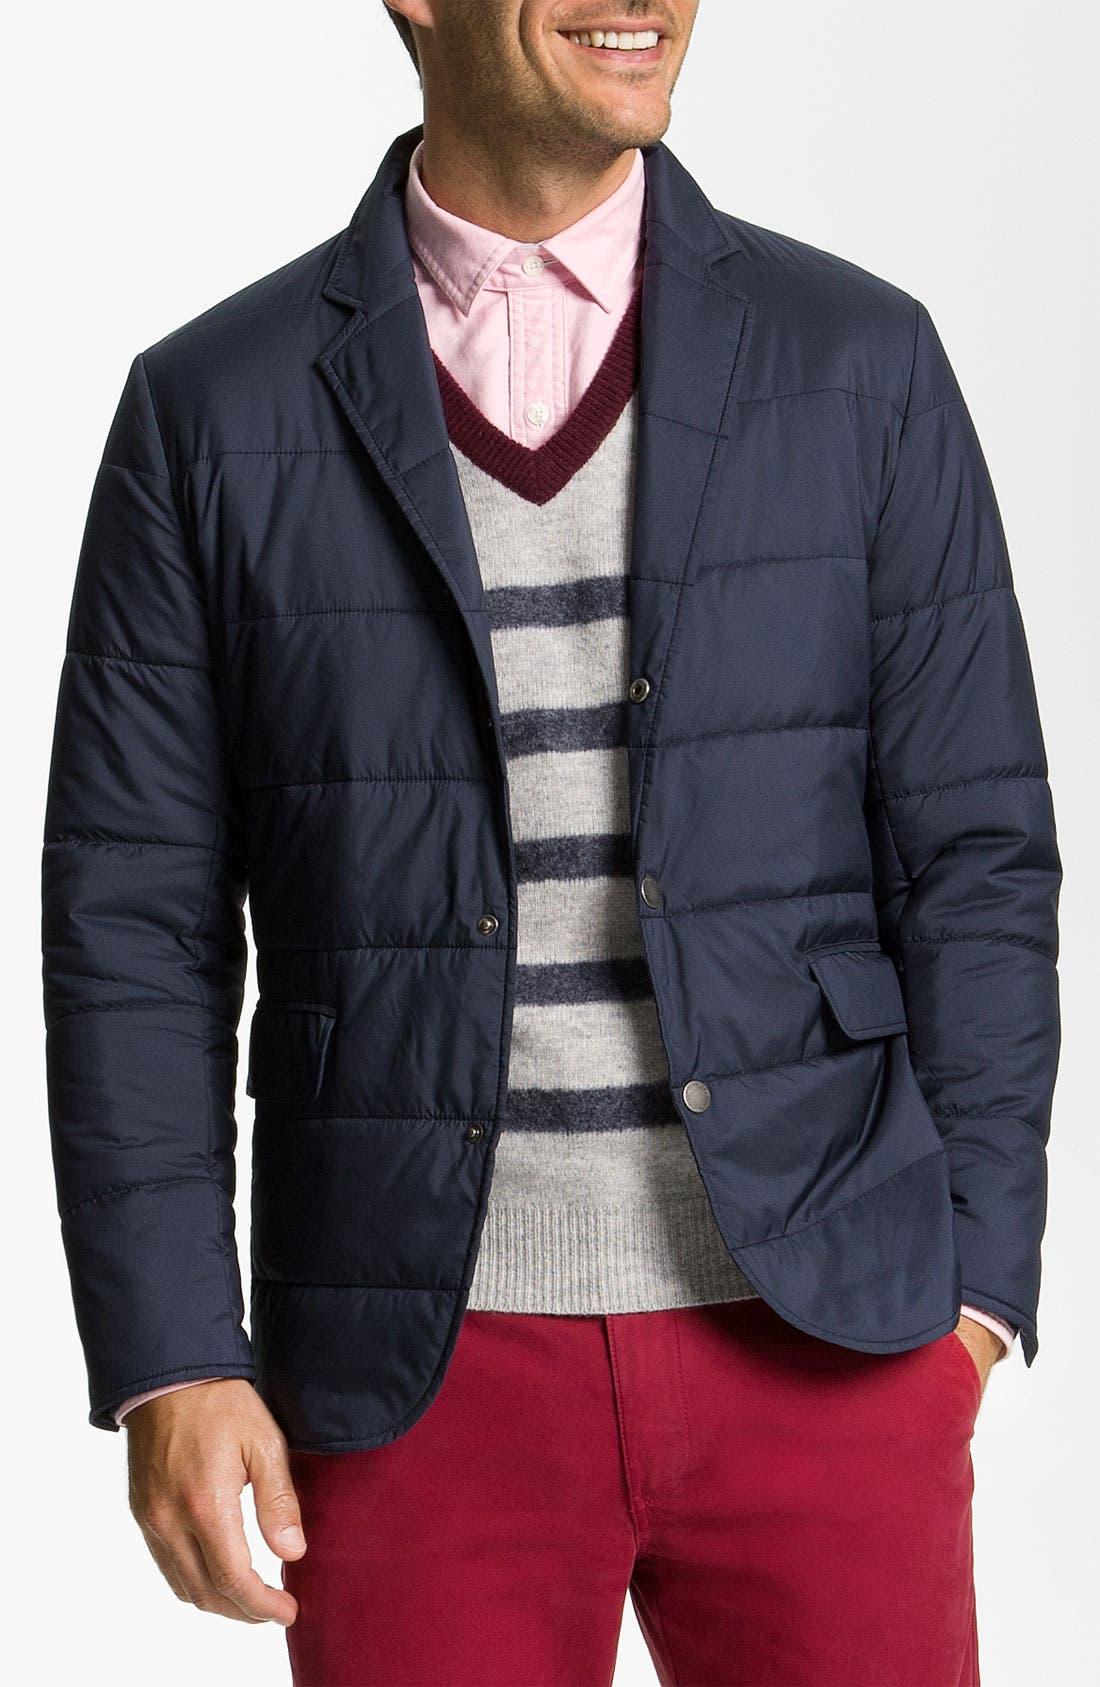 Main Image - Brooks Brothers 'University' Quilted Blazer-Cut Jacket